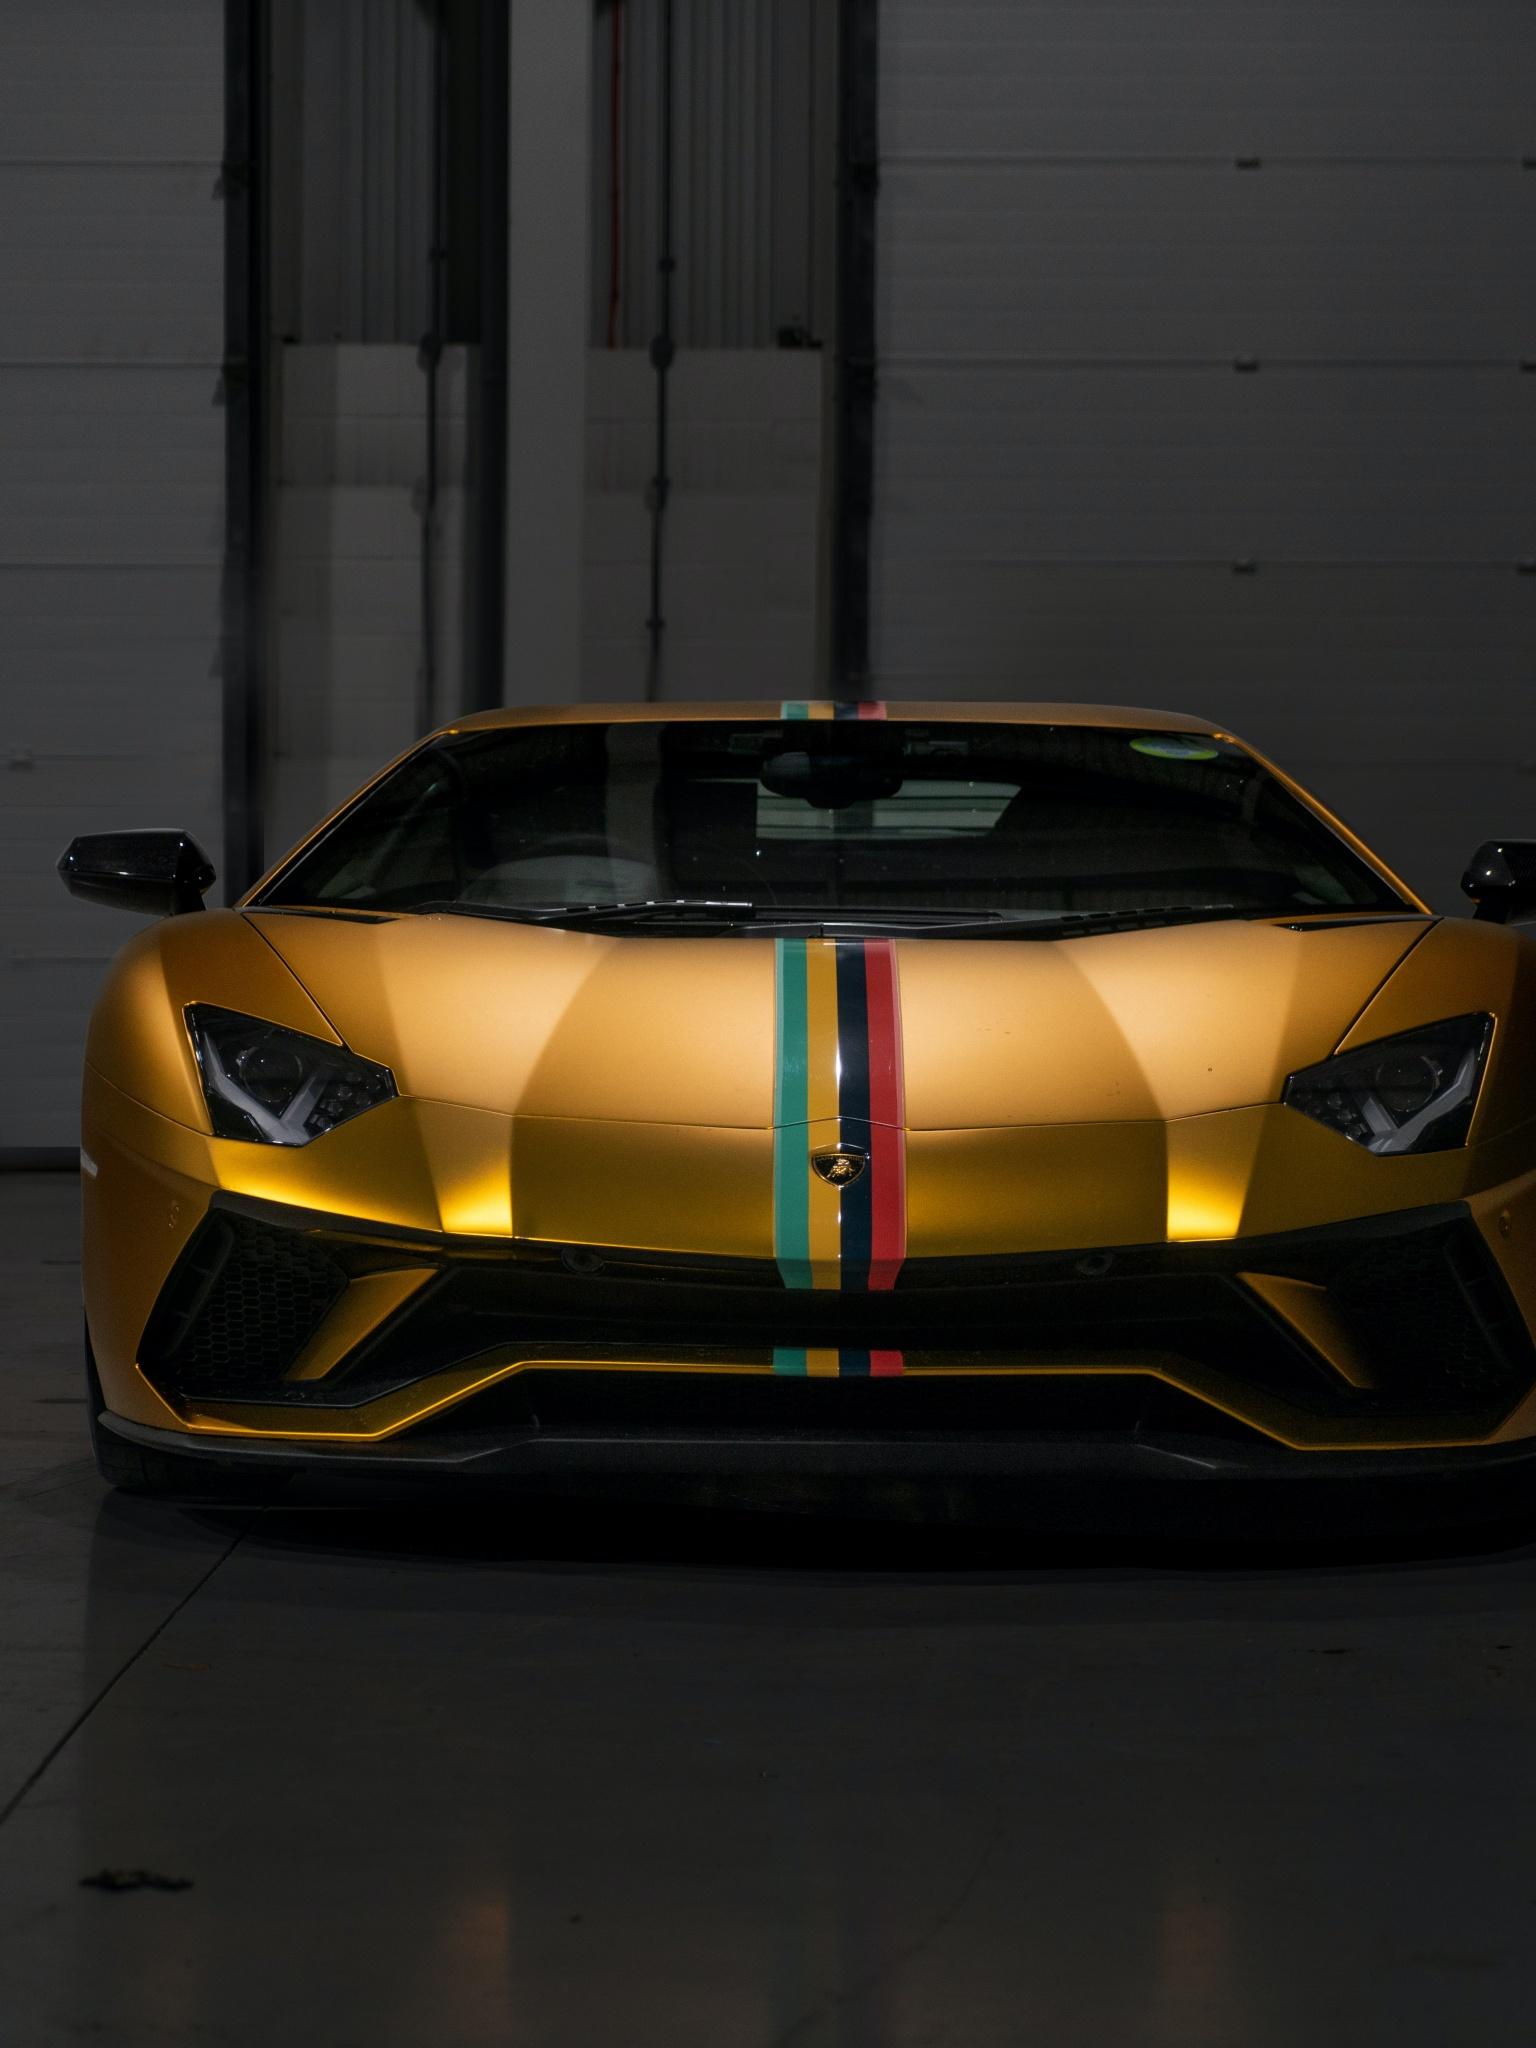 Lamborghini Aventador 4K Wallpaper, Sports cars, Golden ...